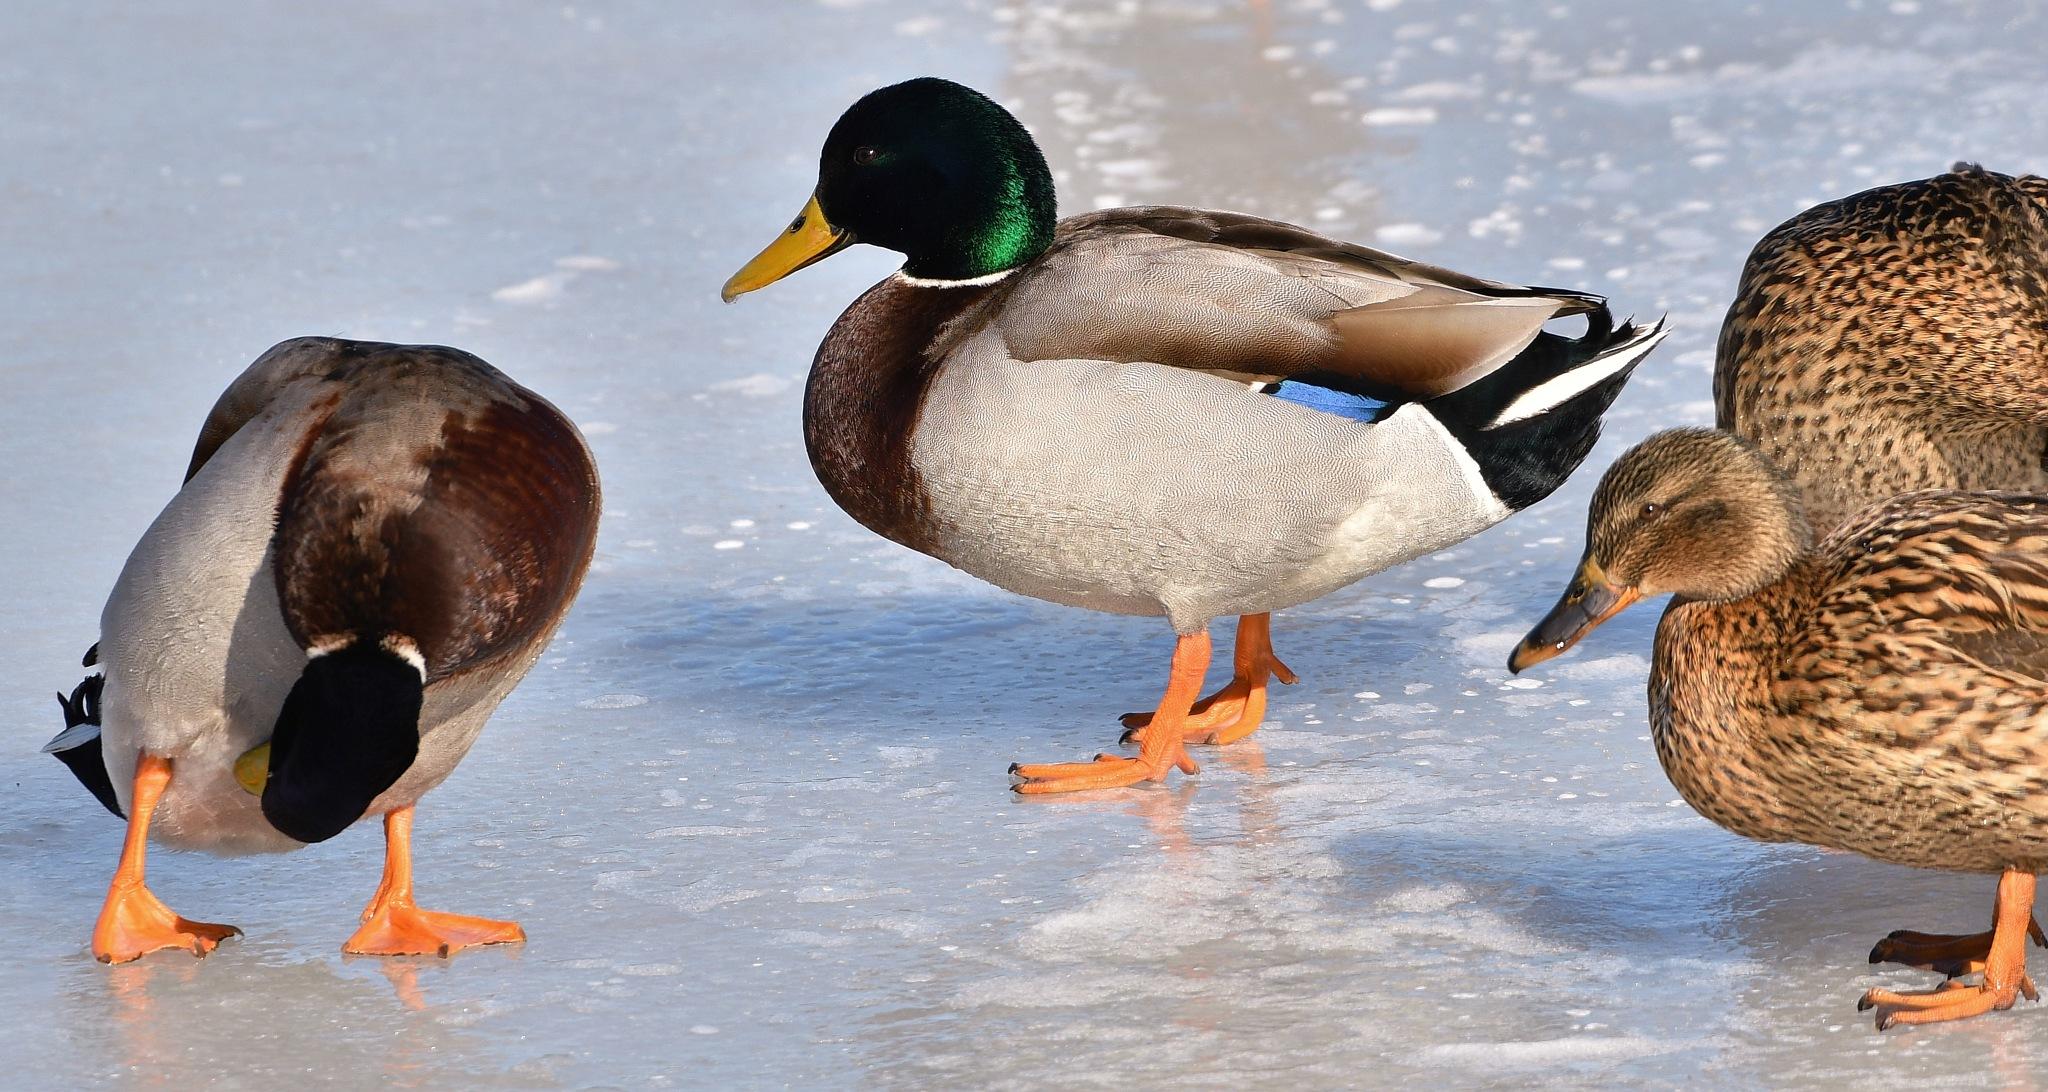 Mallards on the ice by Per Göthe